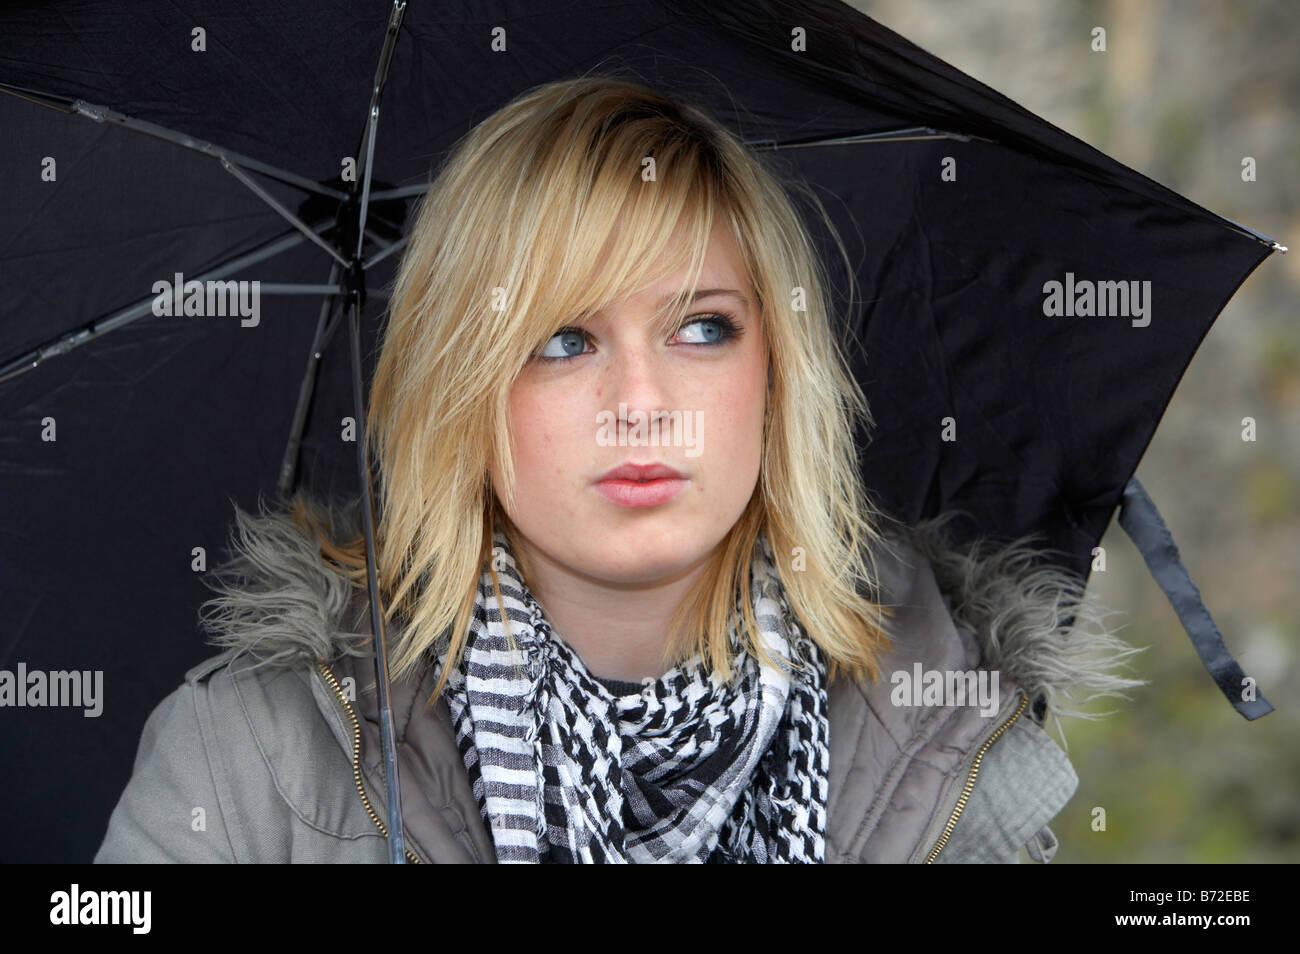 blonde 18 year old girl holding black umbrella wearing jacket and